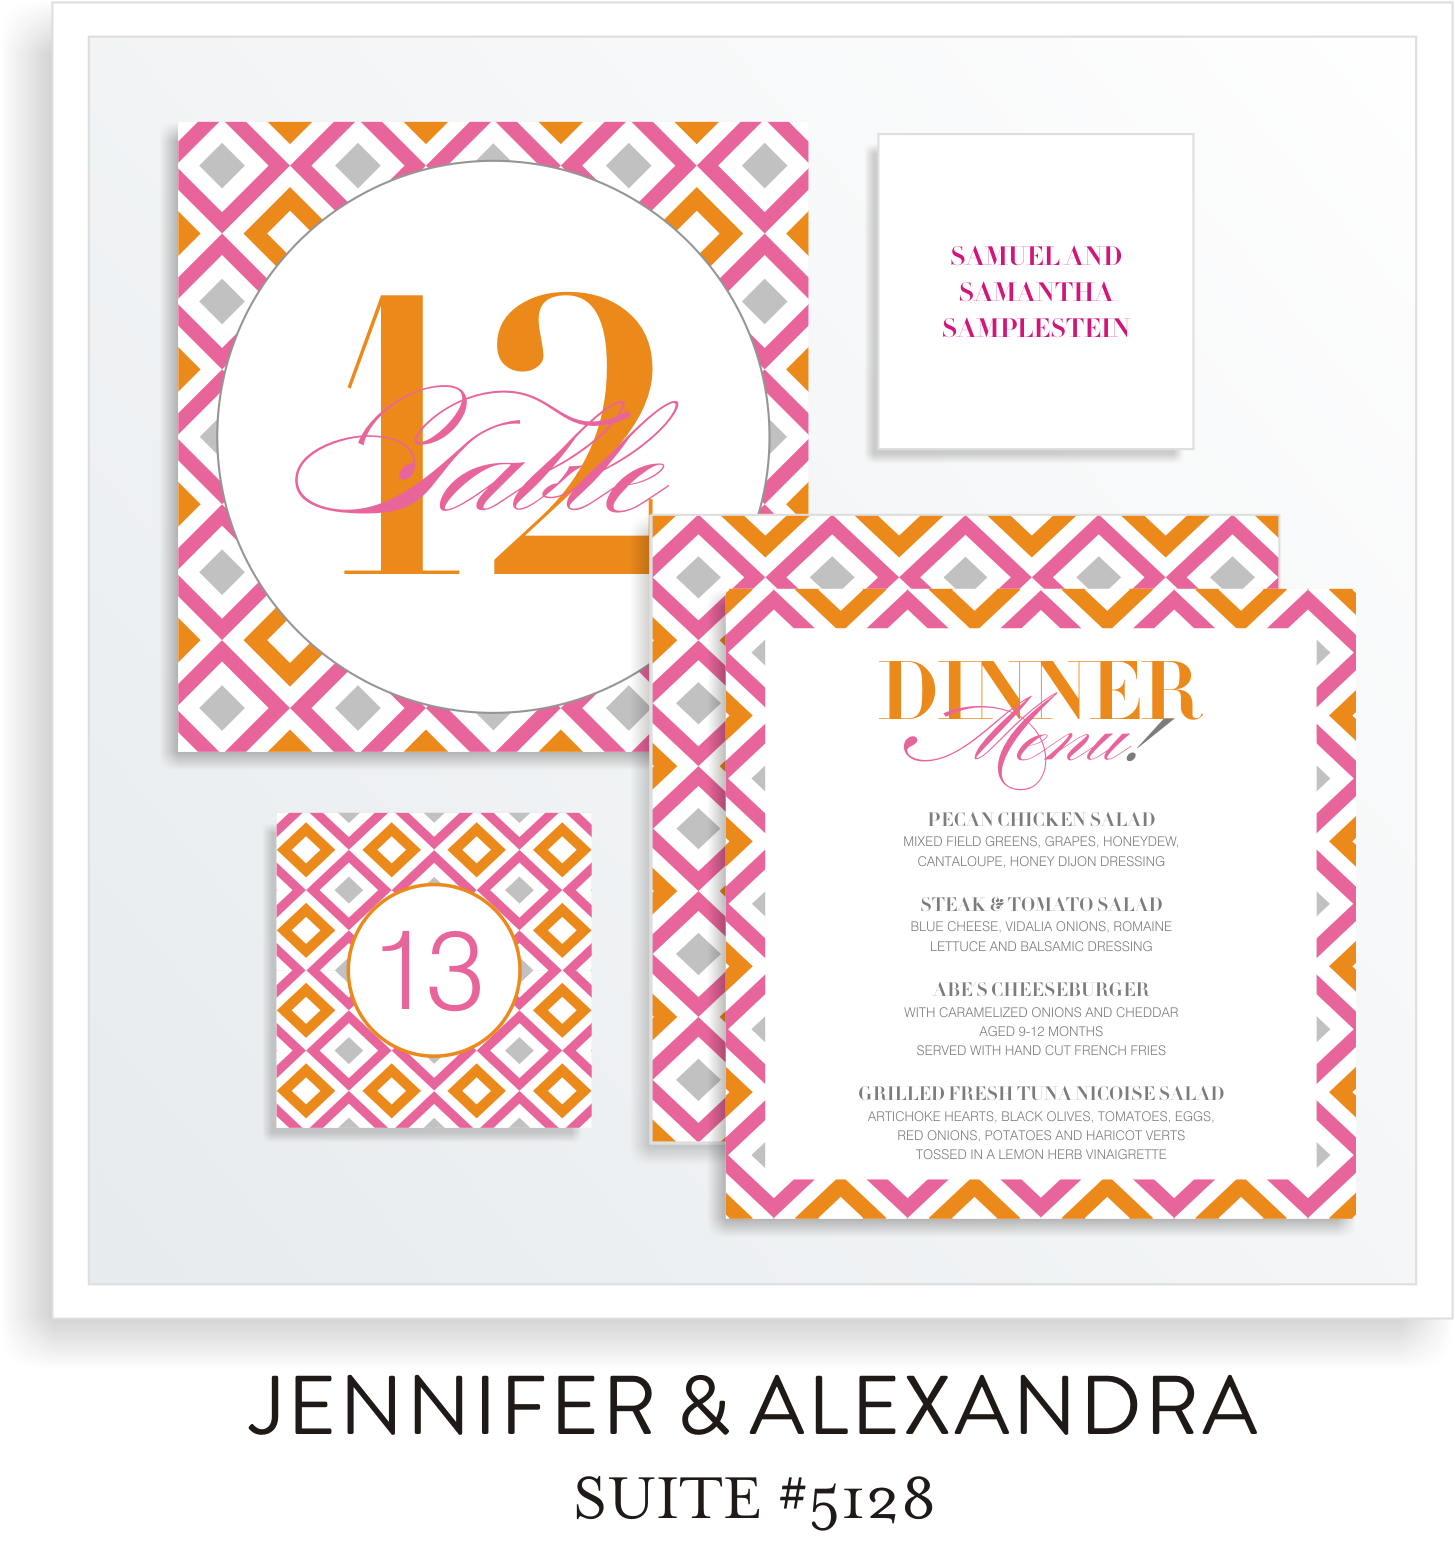 Table Top Decor B'not Mitzvah Suite 5128 - Jennifer & Alexandra